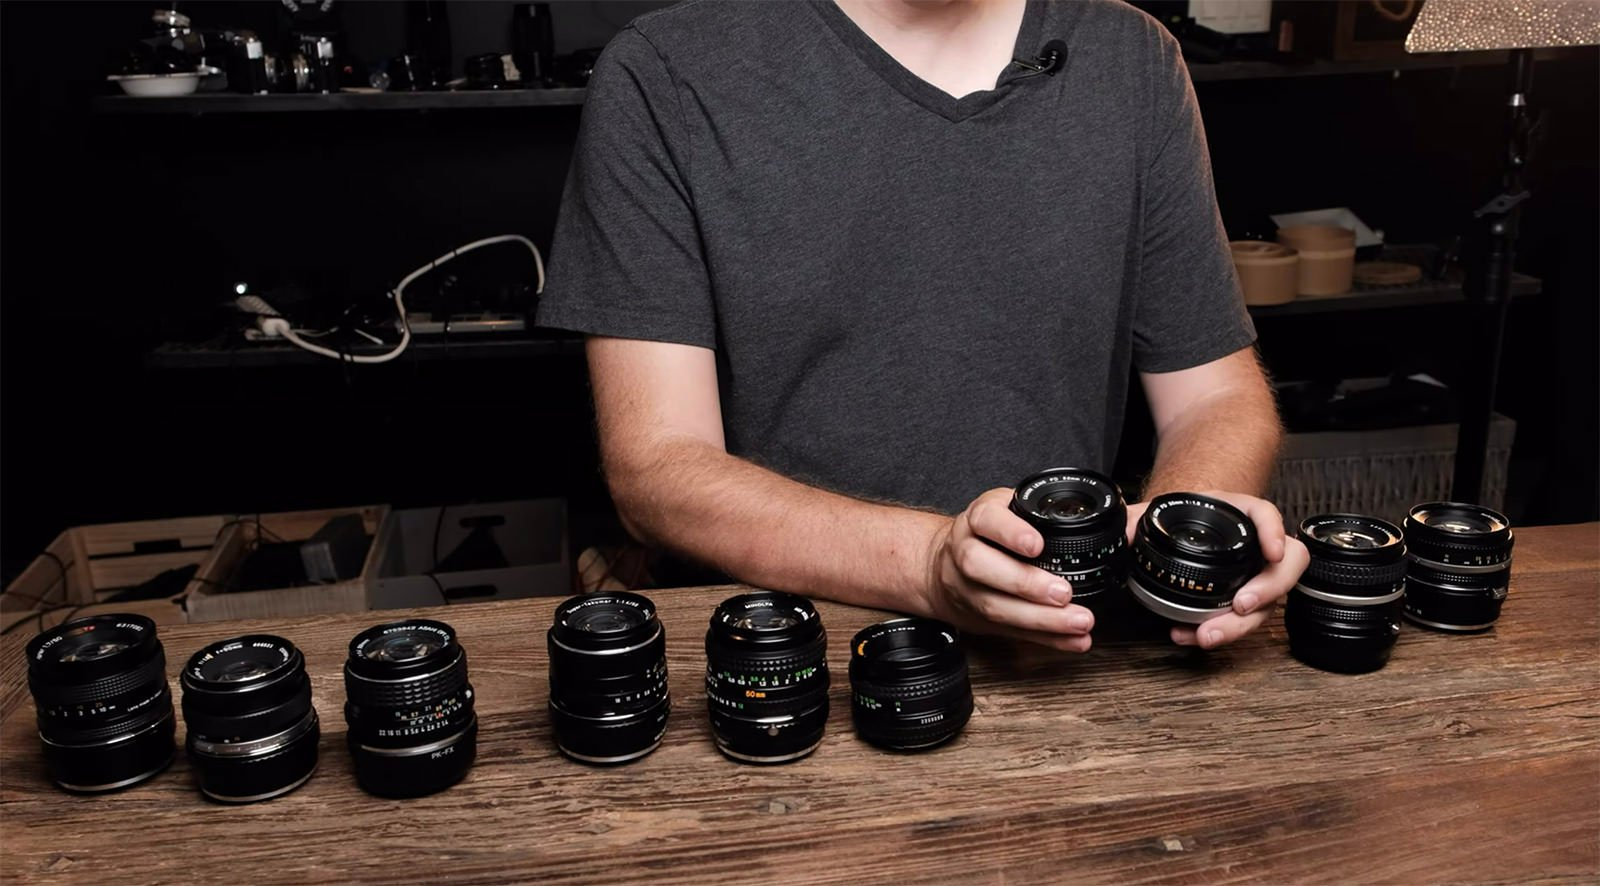 Vintage 50mm Lens Shootout: Trying 10 Lenses Under $100